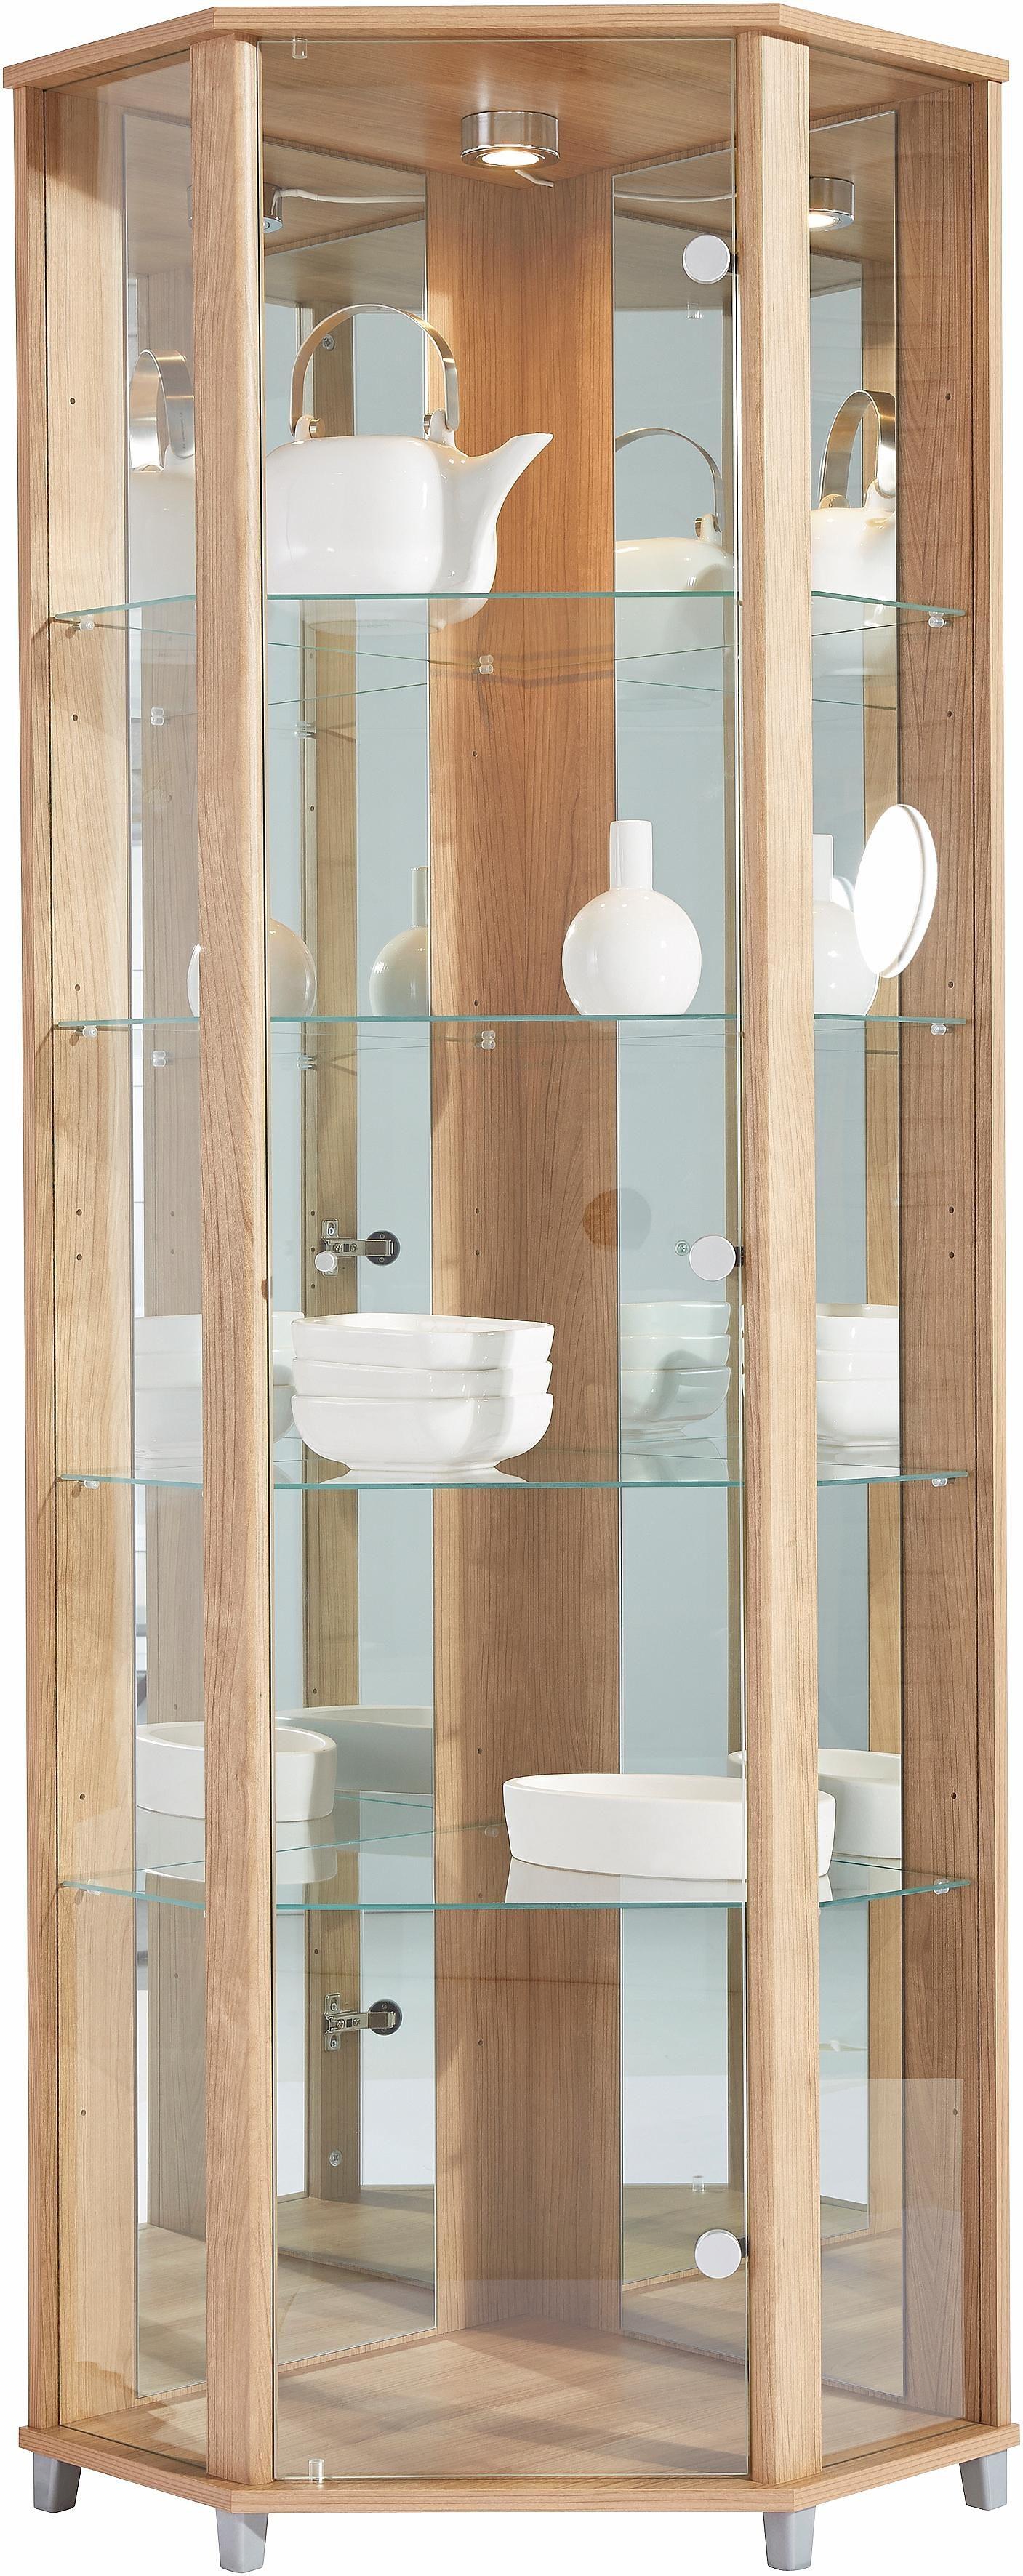 Eckvitrine, Höhe 172 cm, 4 Glasböden | Wohnzimmer > Vitrinen > Eckvitrinen | Braun | Melamin | QUELLE